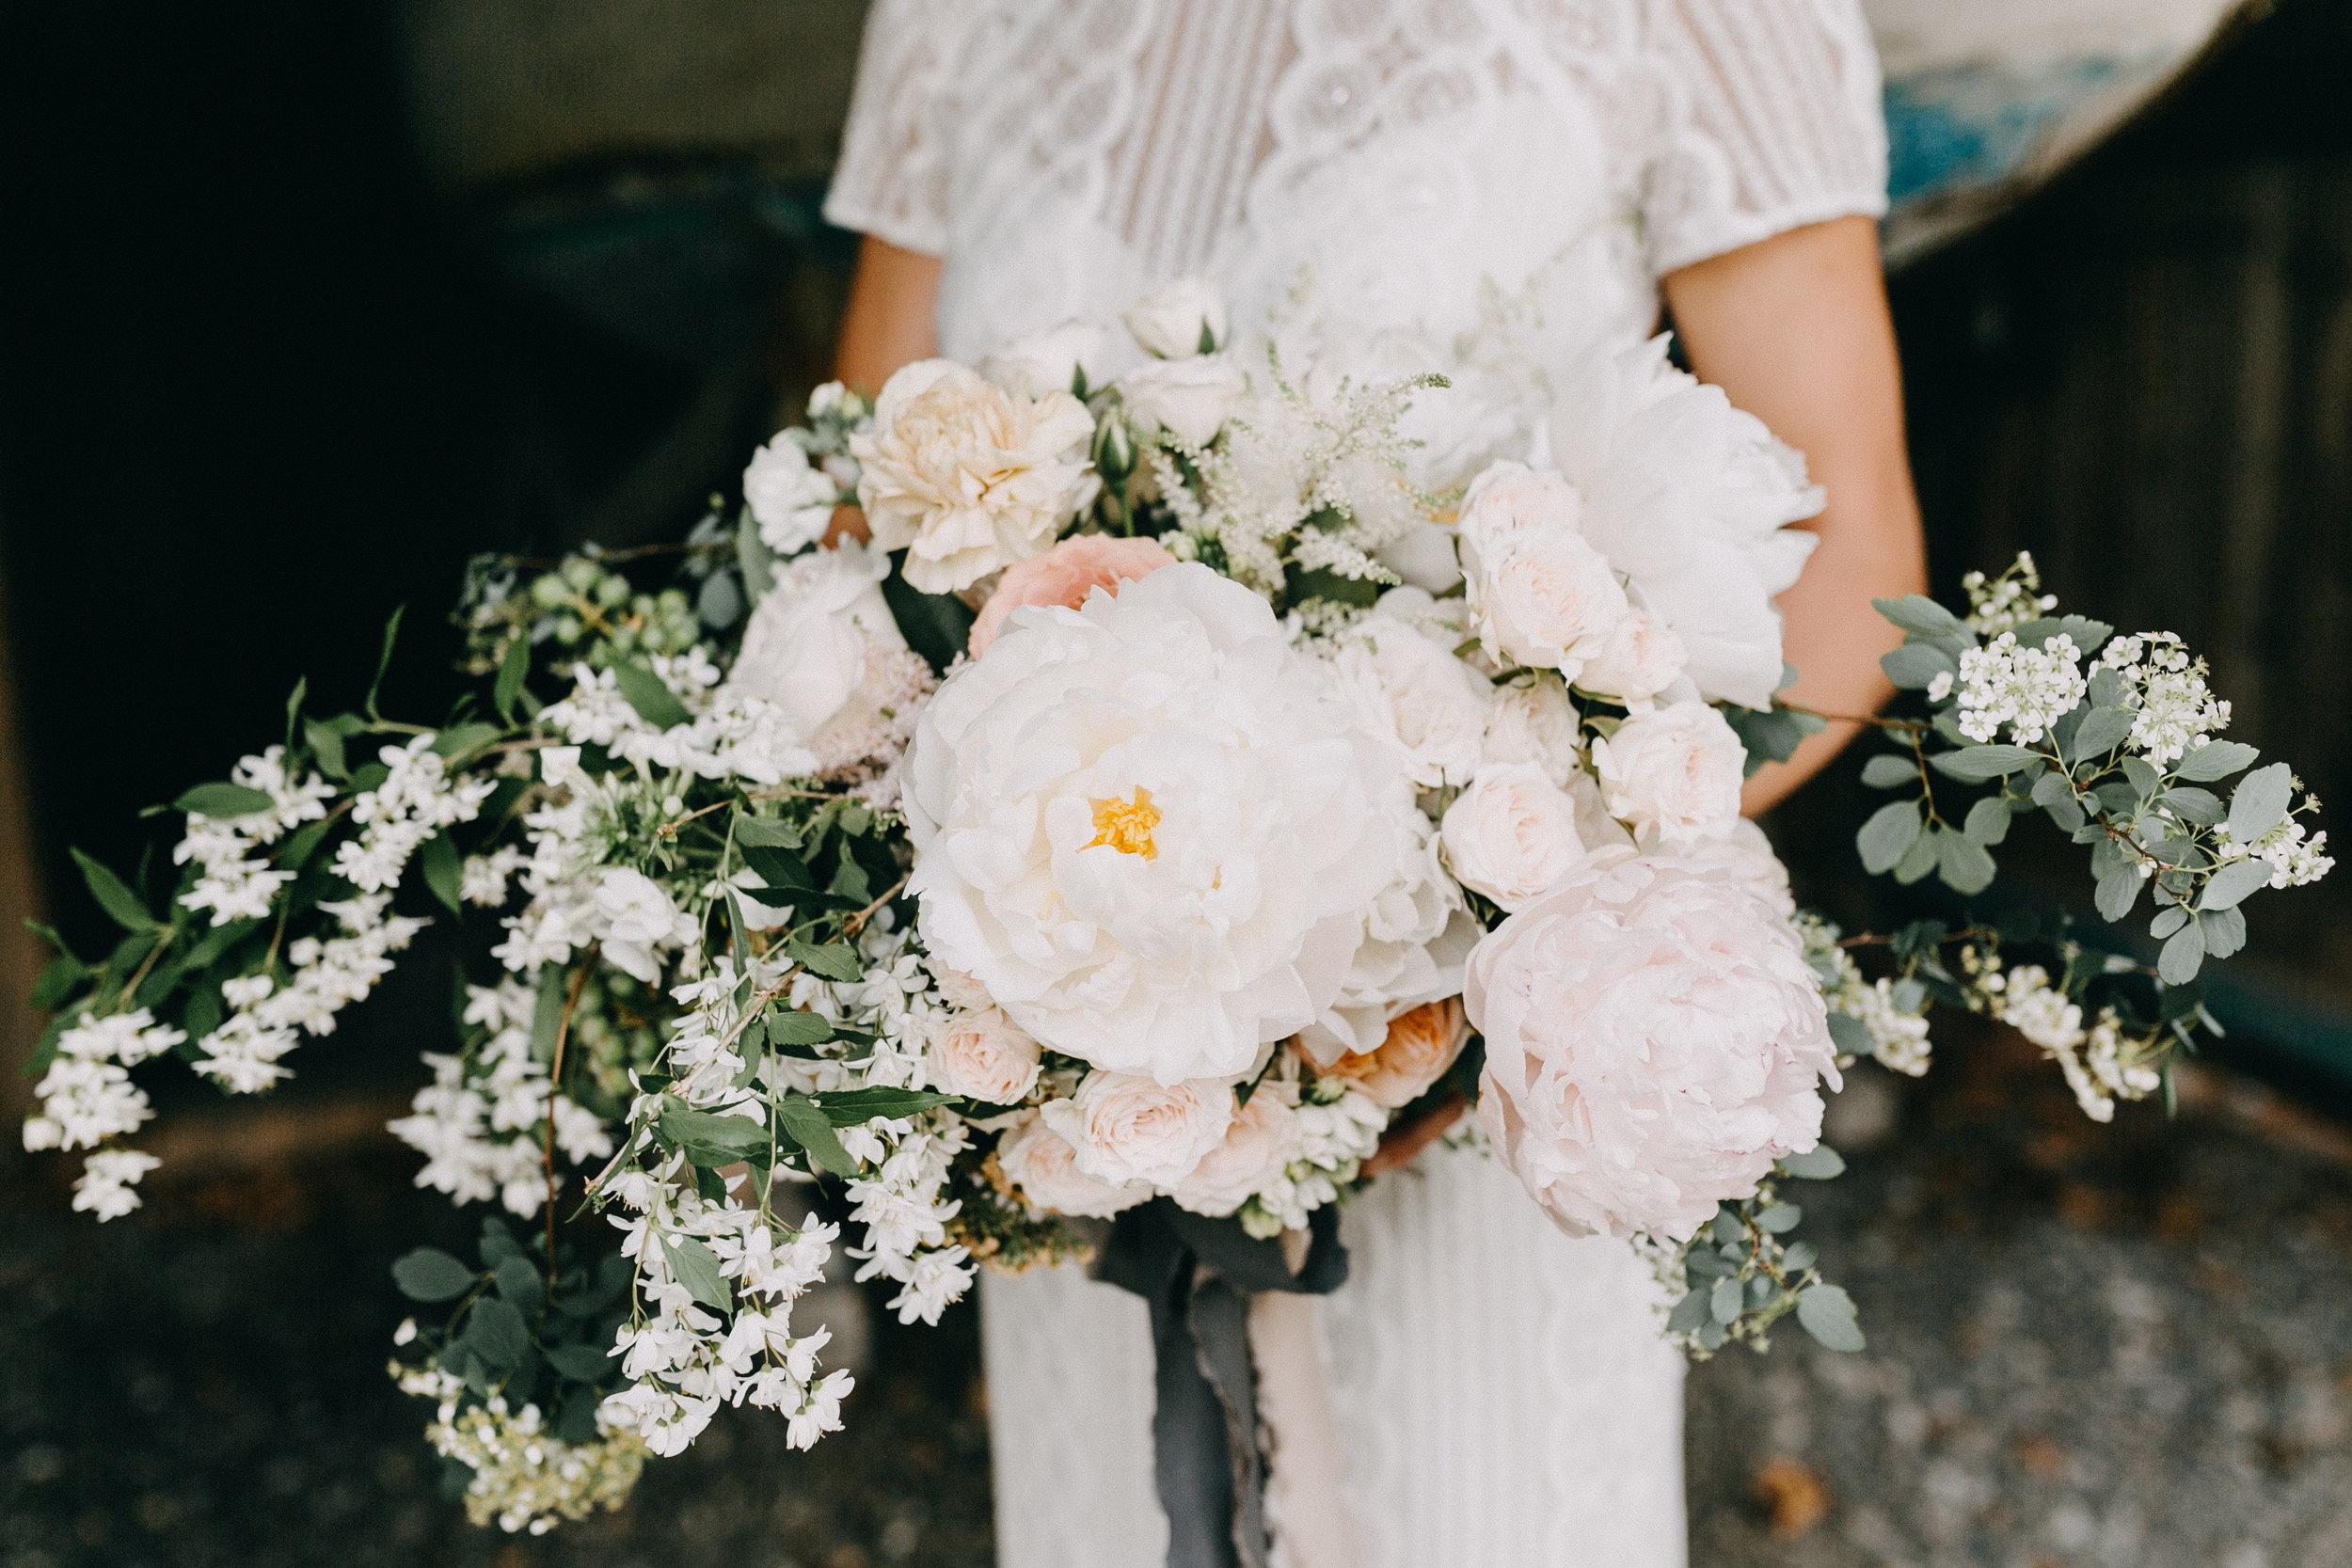 Watershed-Floral-Maine-Maritime-Wedding-Bridal-Bouquet-Centerpieces-0119.jpg